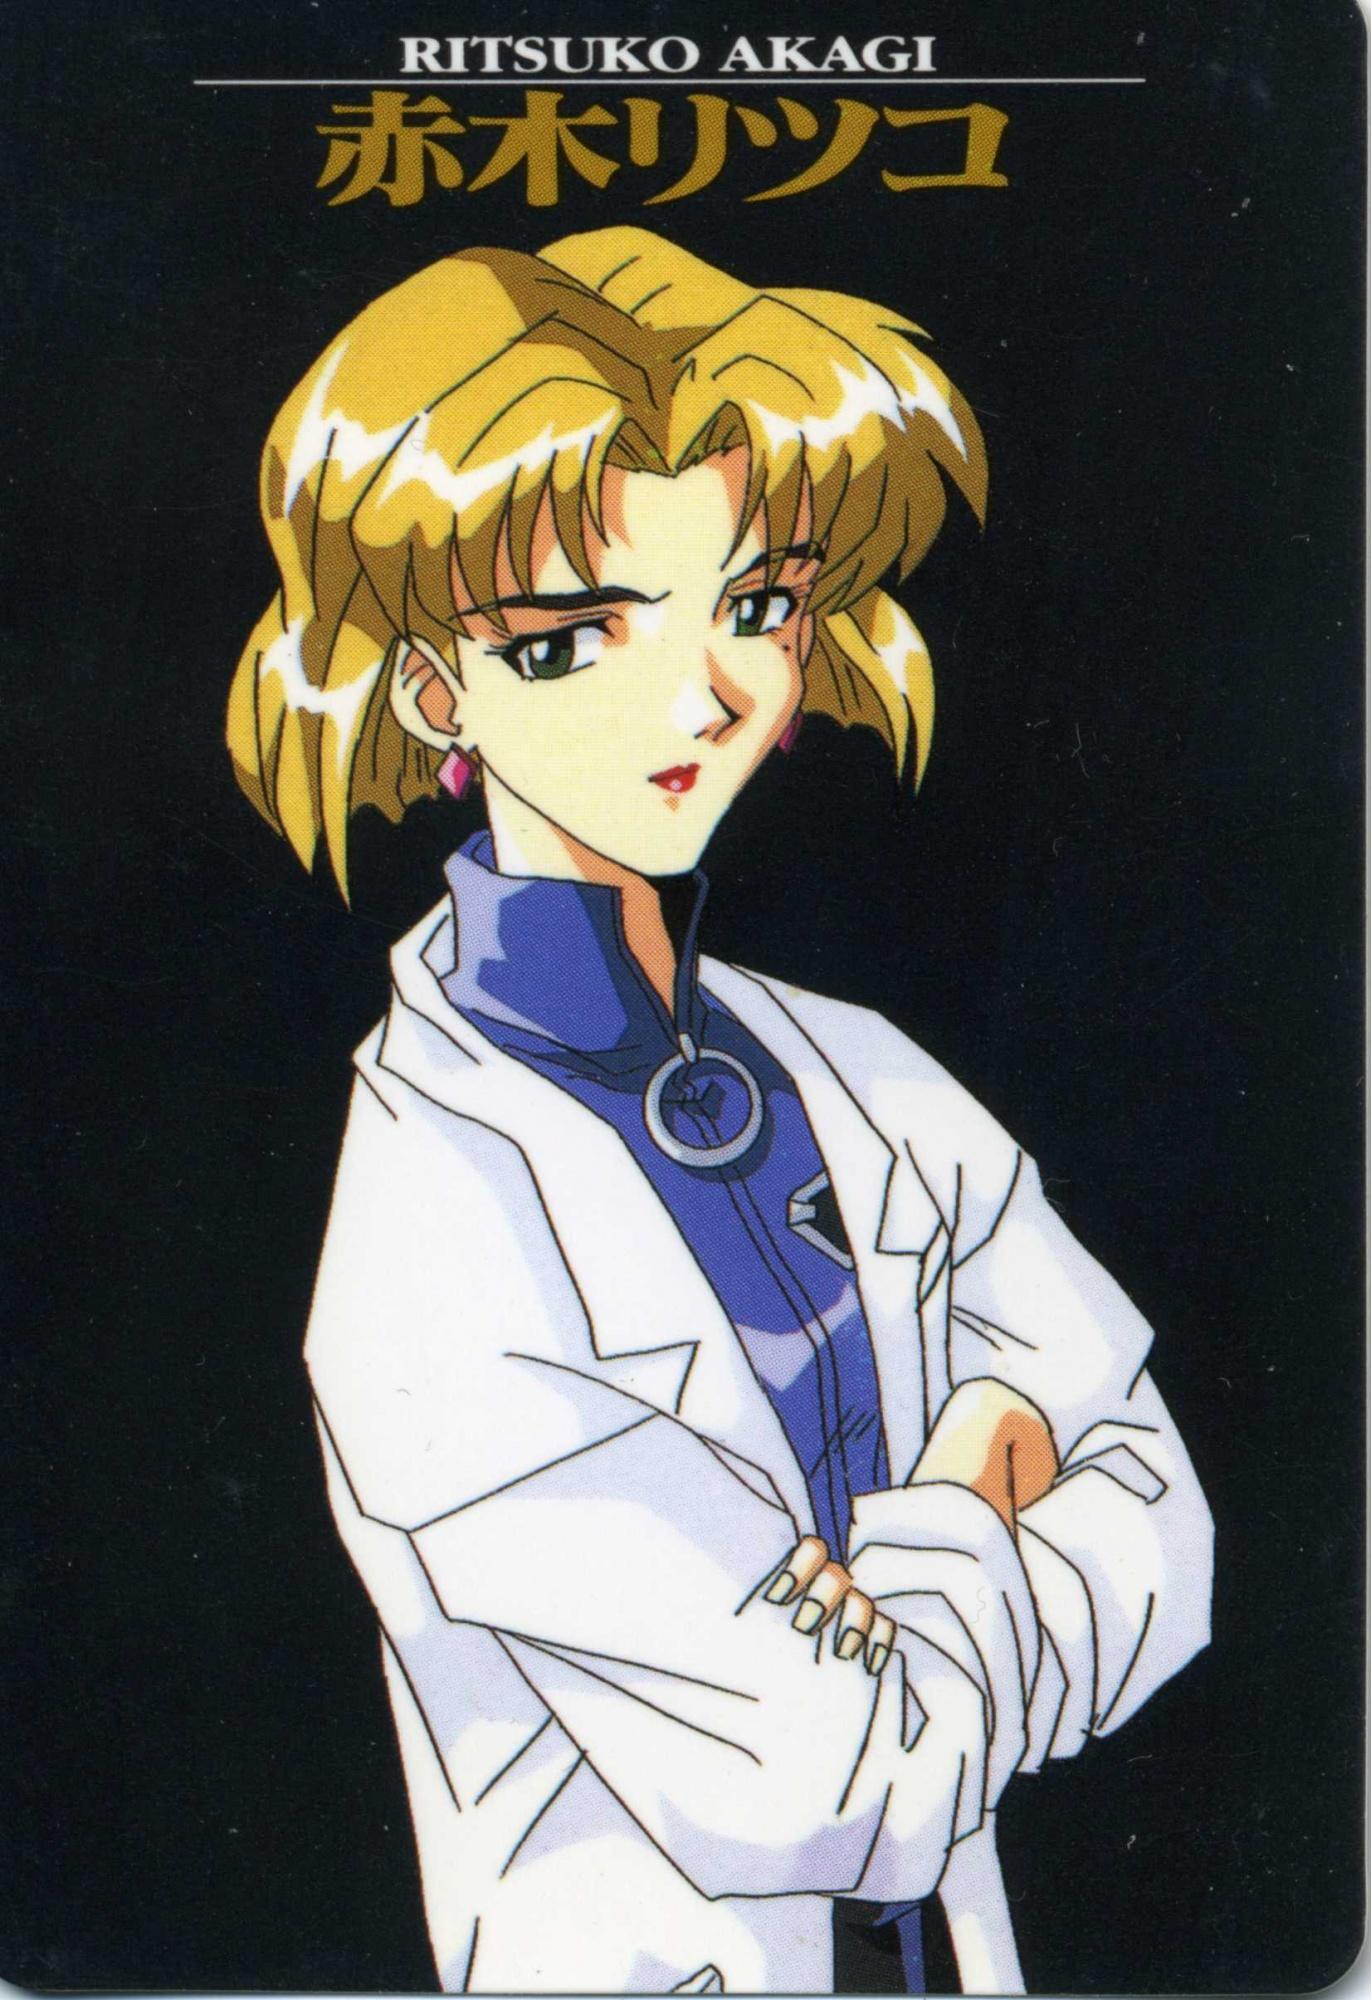 Akagi Ritsuko   My Anime Shelf